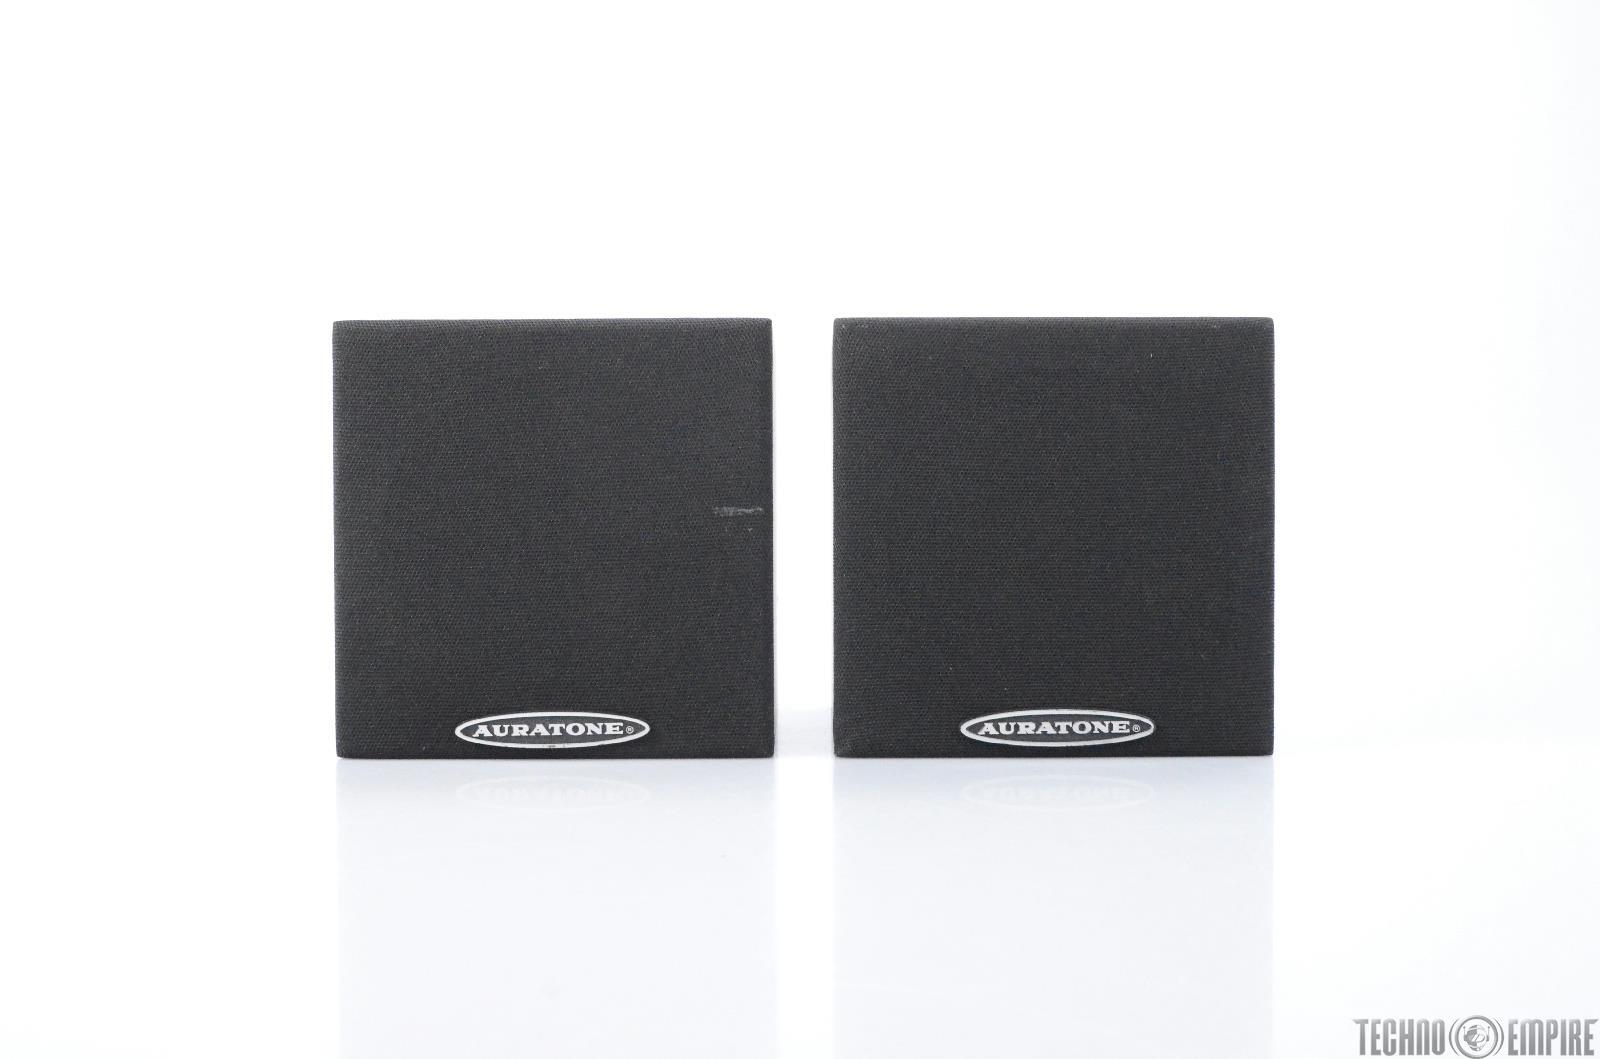 AURATONE Ultra Sound Cube Studio Monitor Speakers #27685